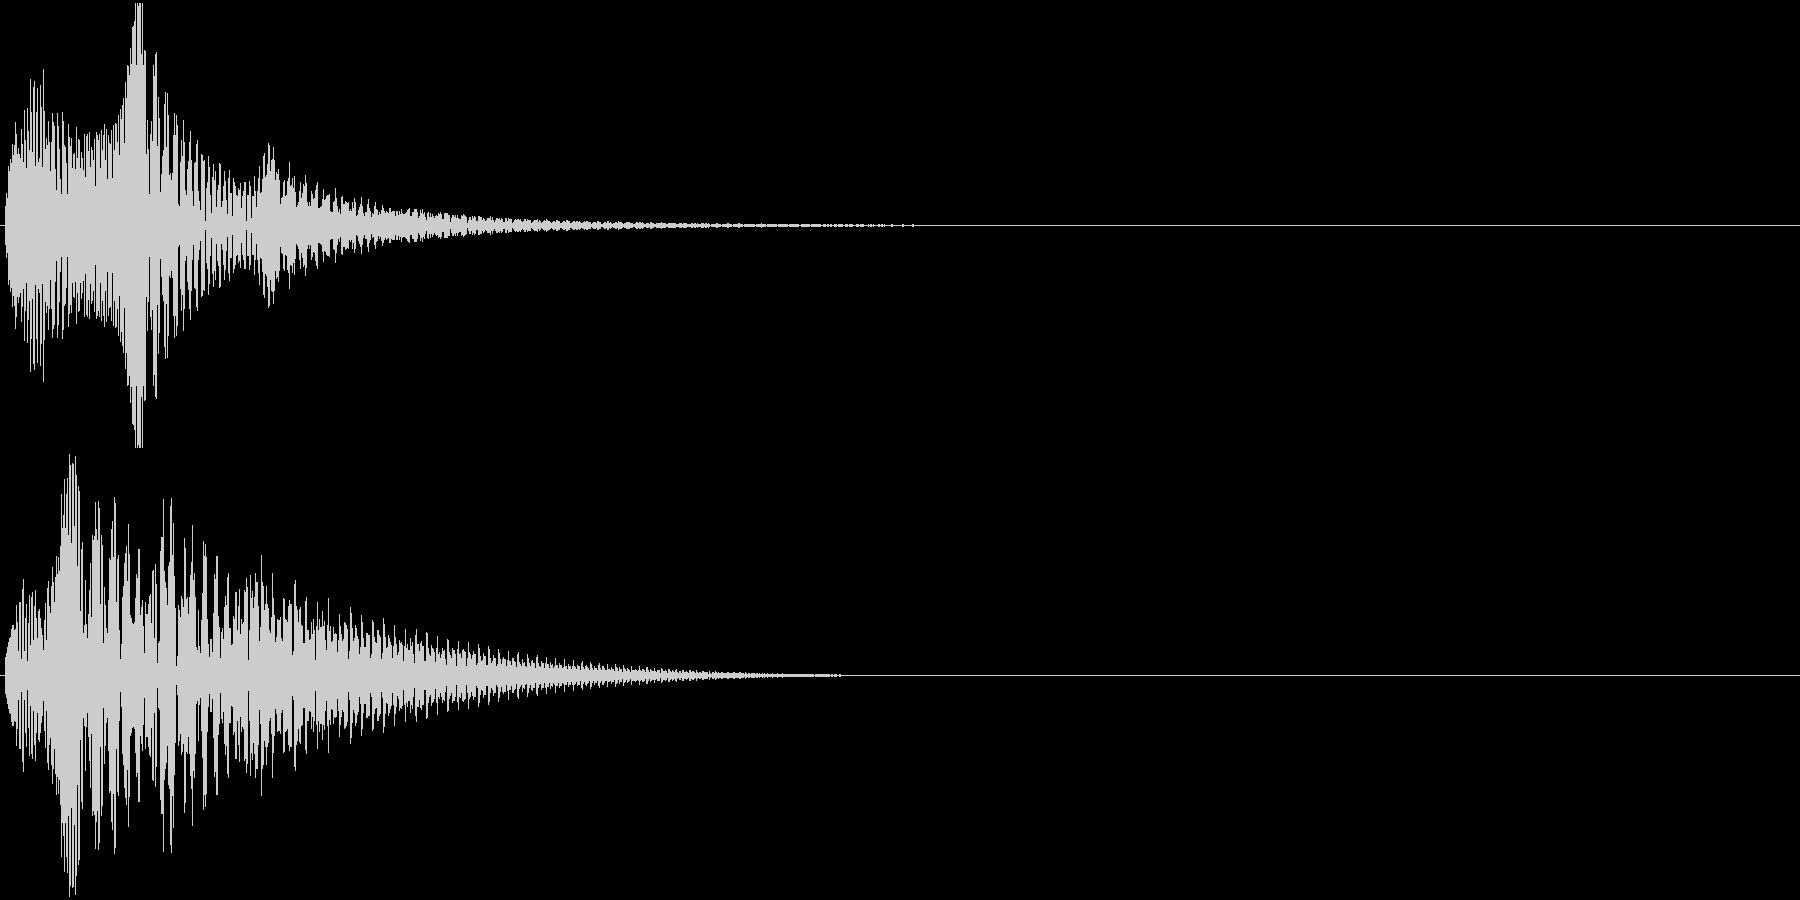 Baby 幼児玩具向け可愛い電子音9の未再生の波形